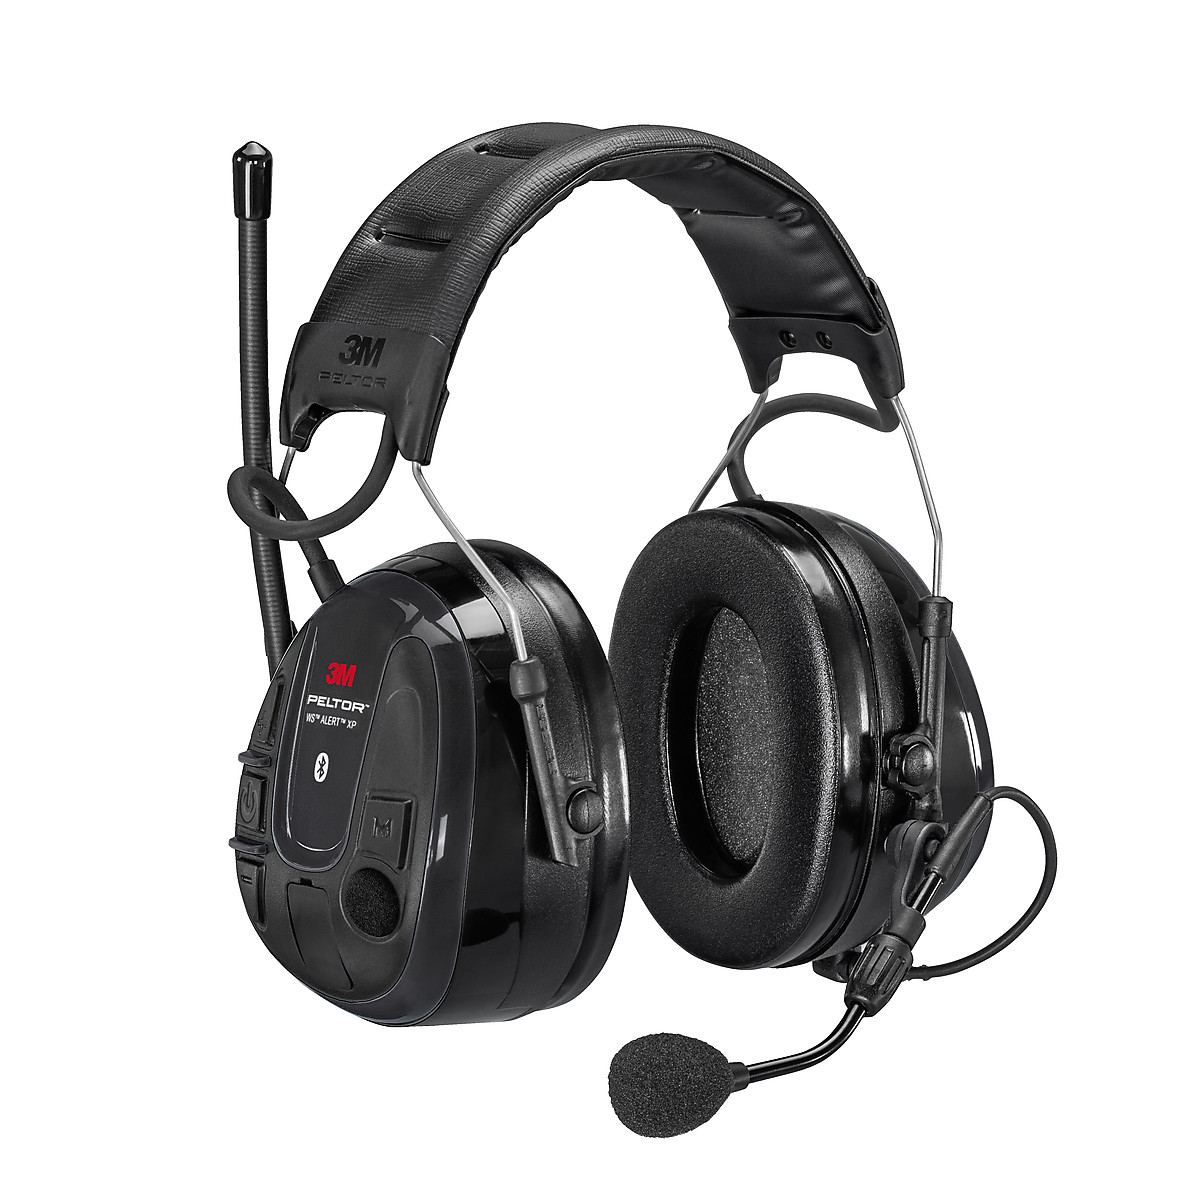 Hörselskydd Peltor WS Alert XP